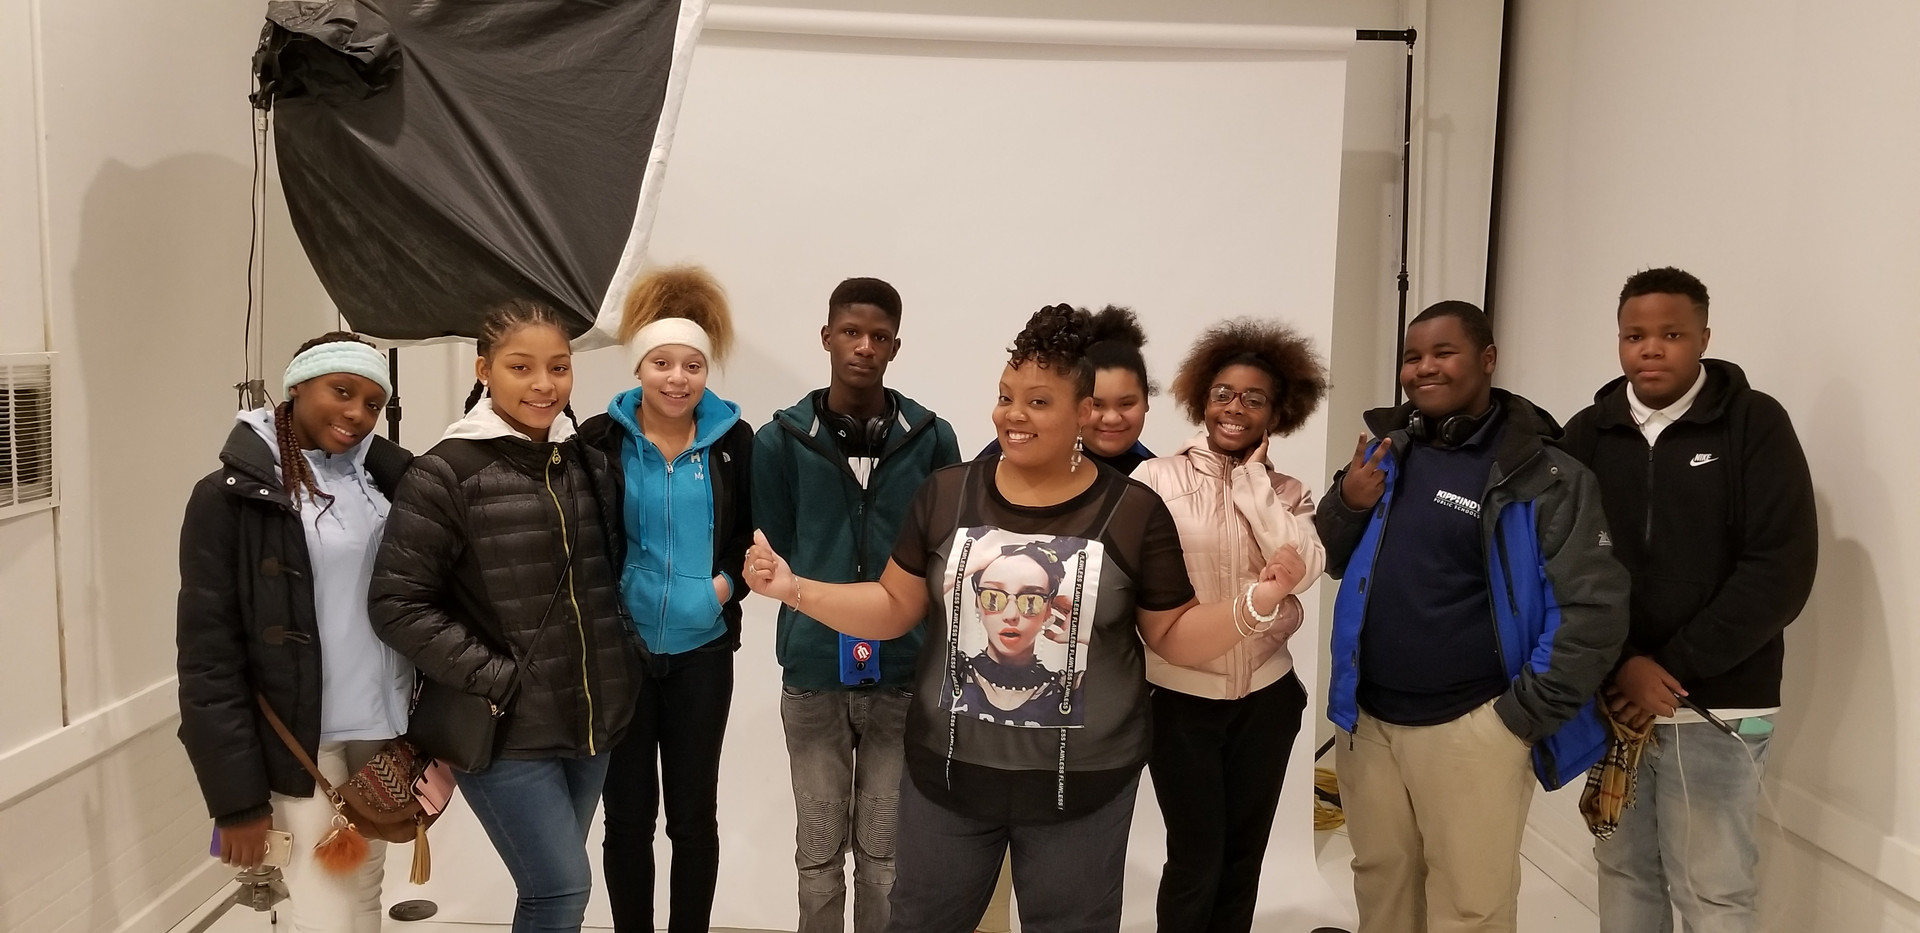 KIPP Indy School 8th Graders with Lady J